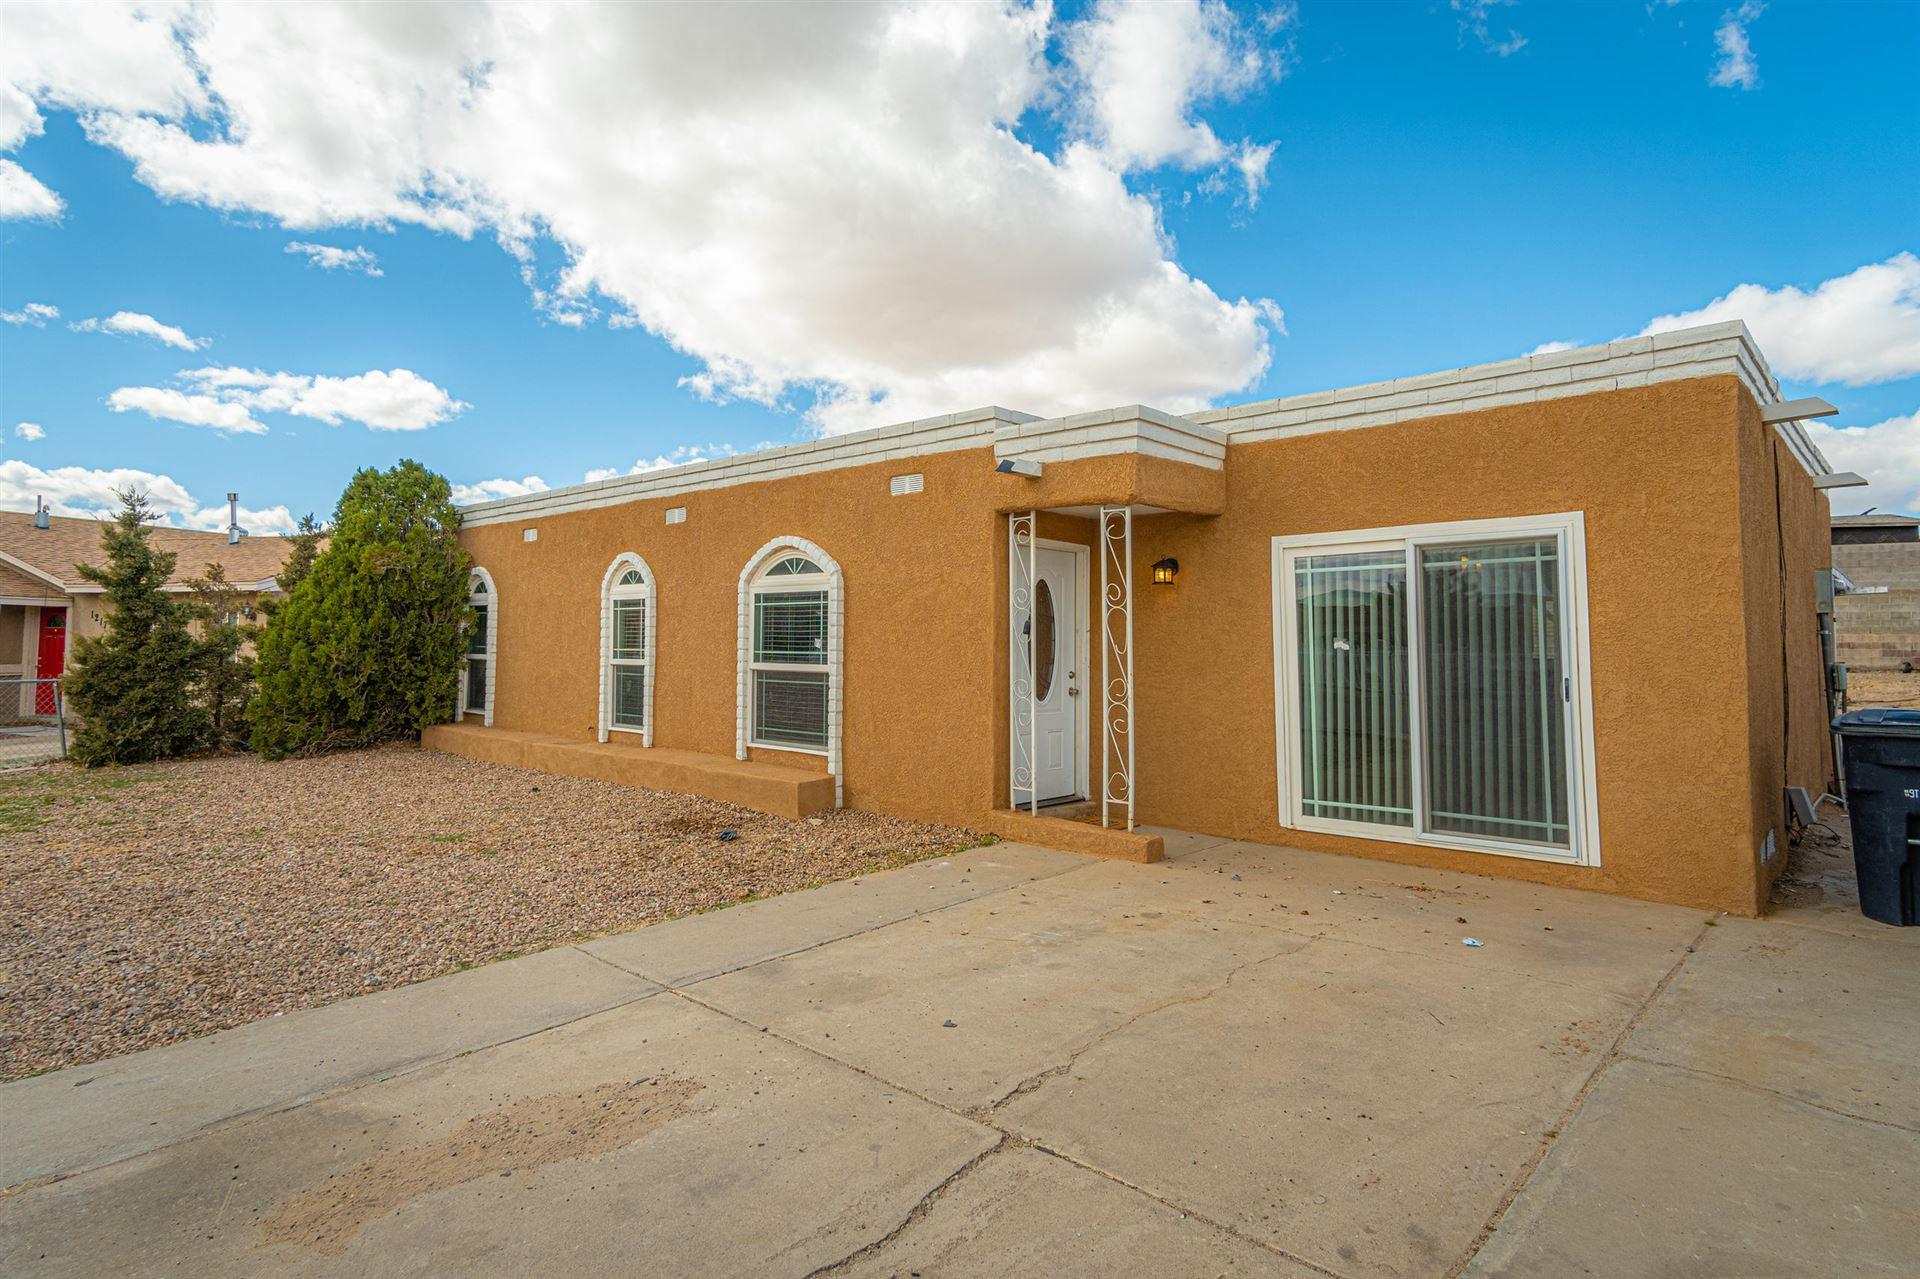 1213 SCOTTY Court SW, Albuquerque, NM 87121 - MLS#: 986997